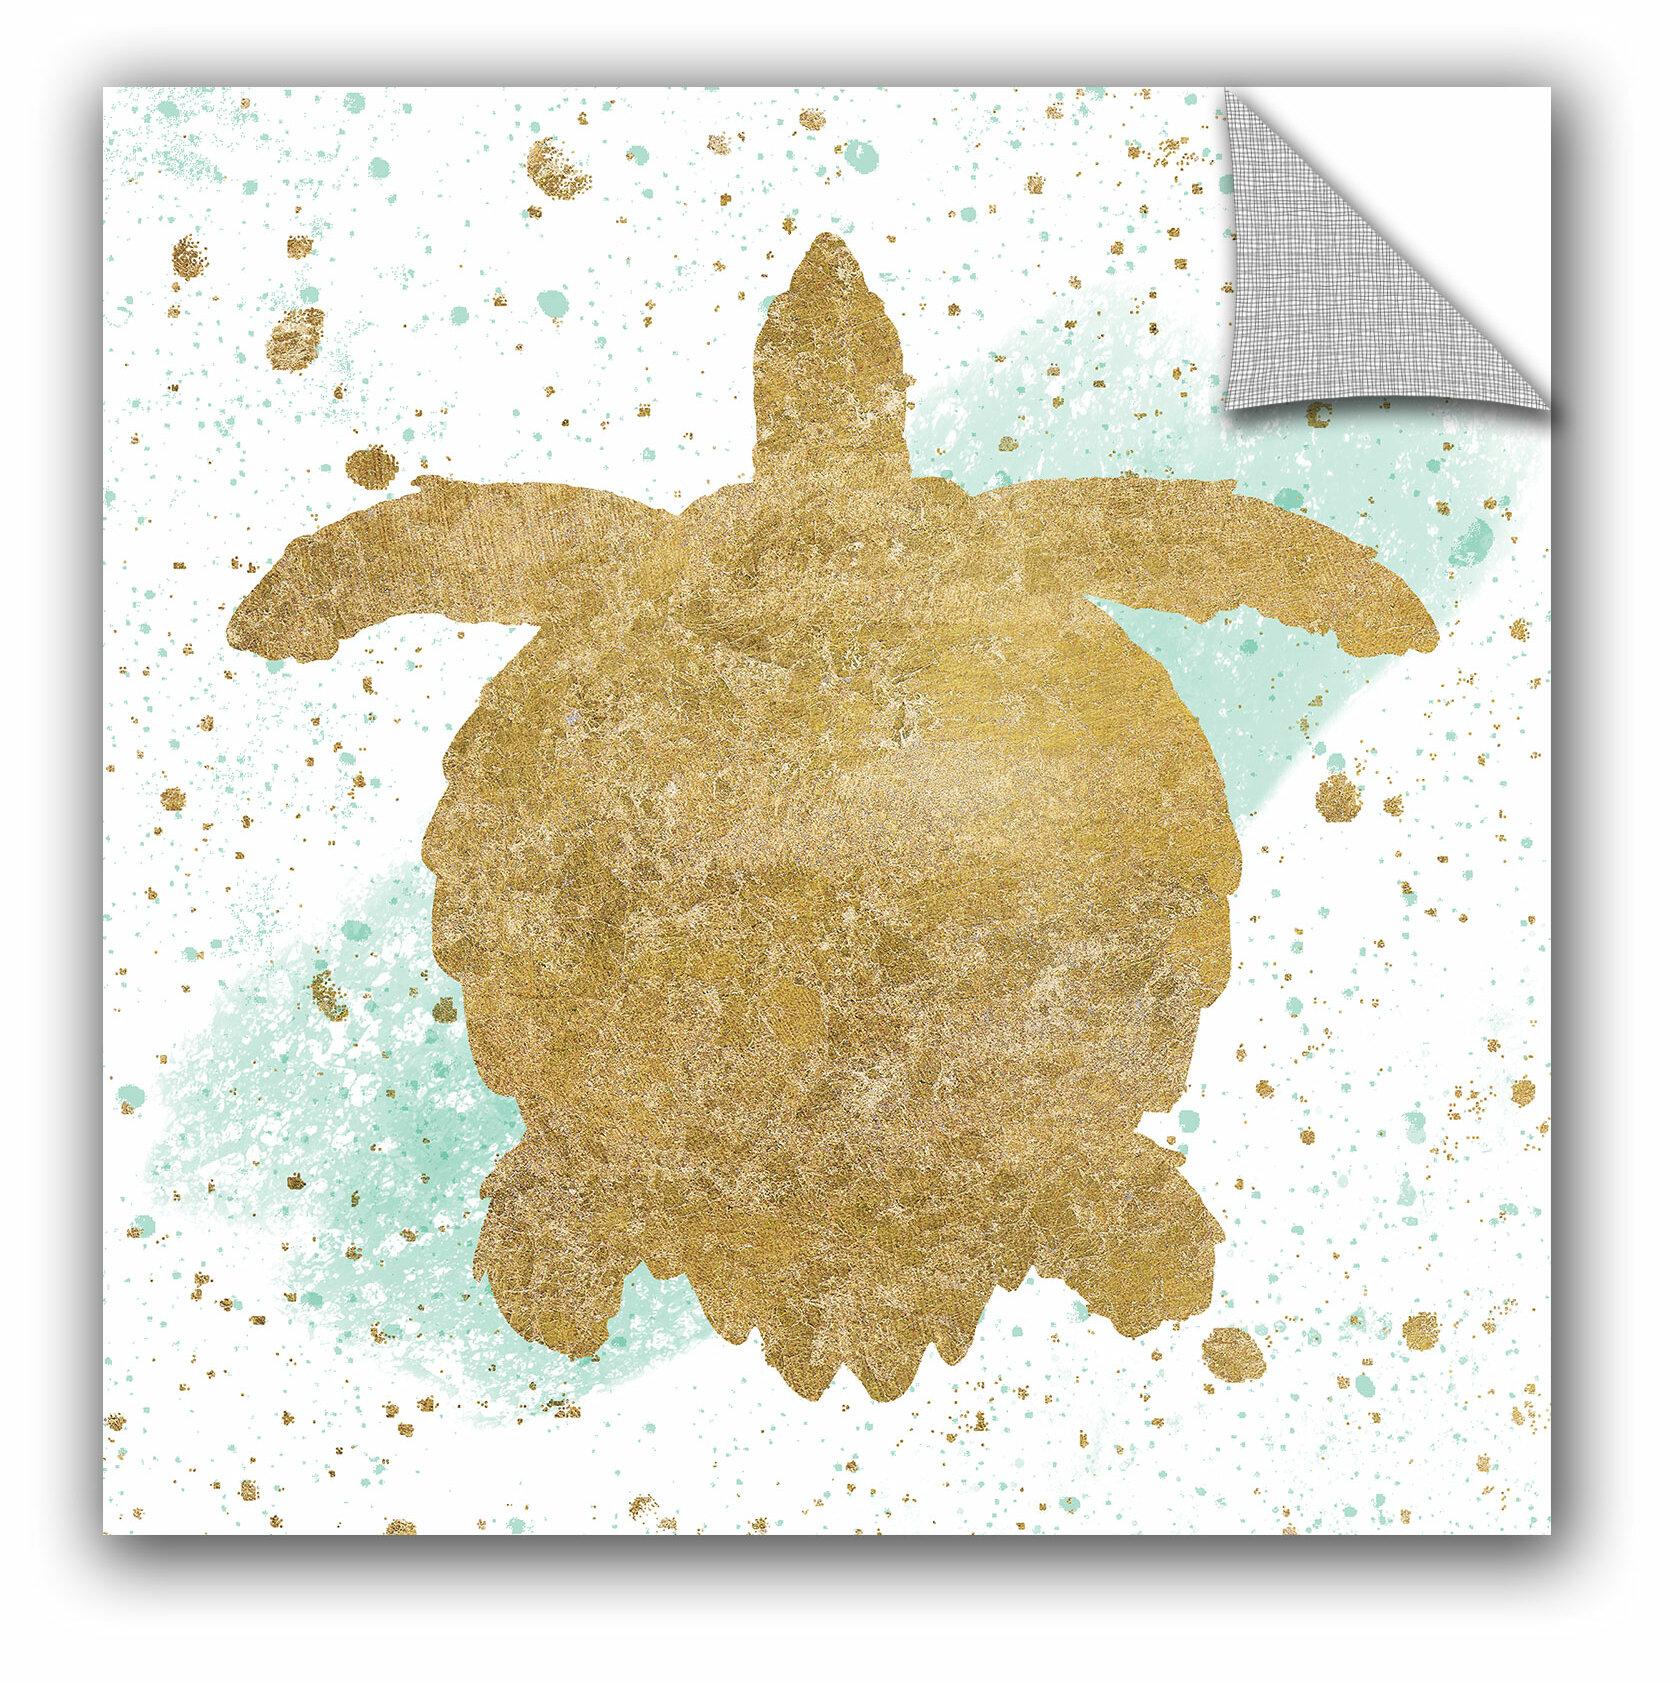 ArtWall Wild Apple Silver Sea Life Aqua Turtle Wall Decal | Wayfair